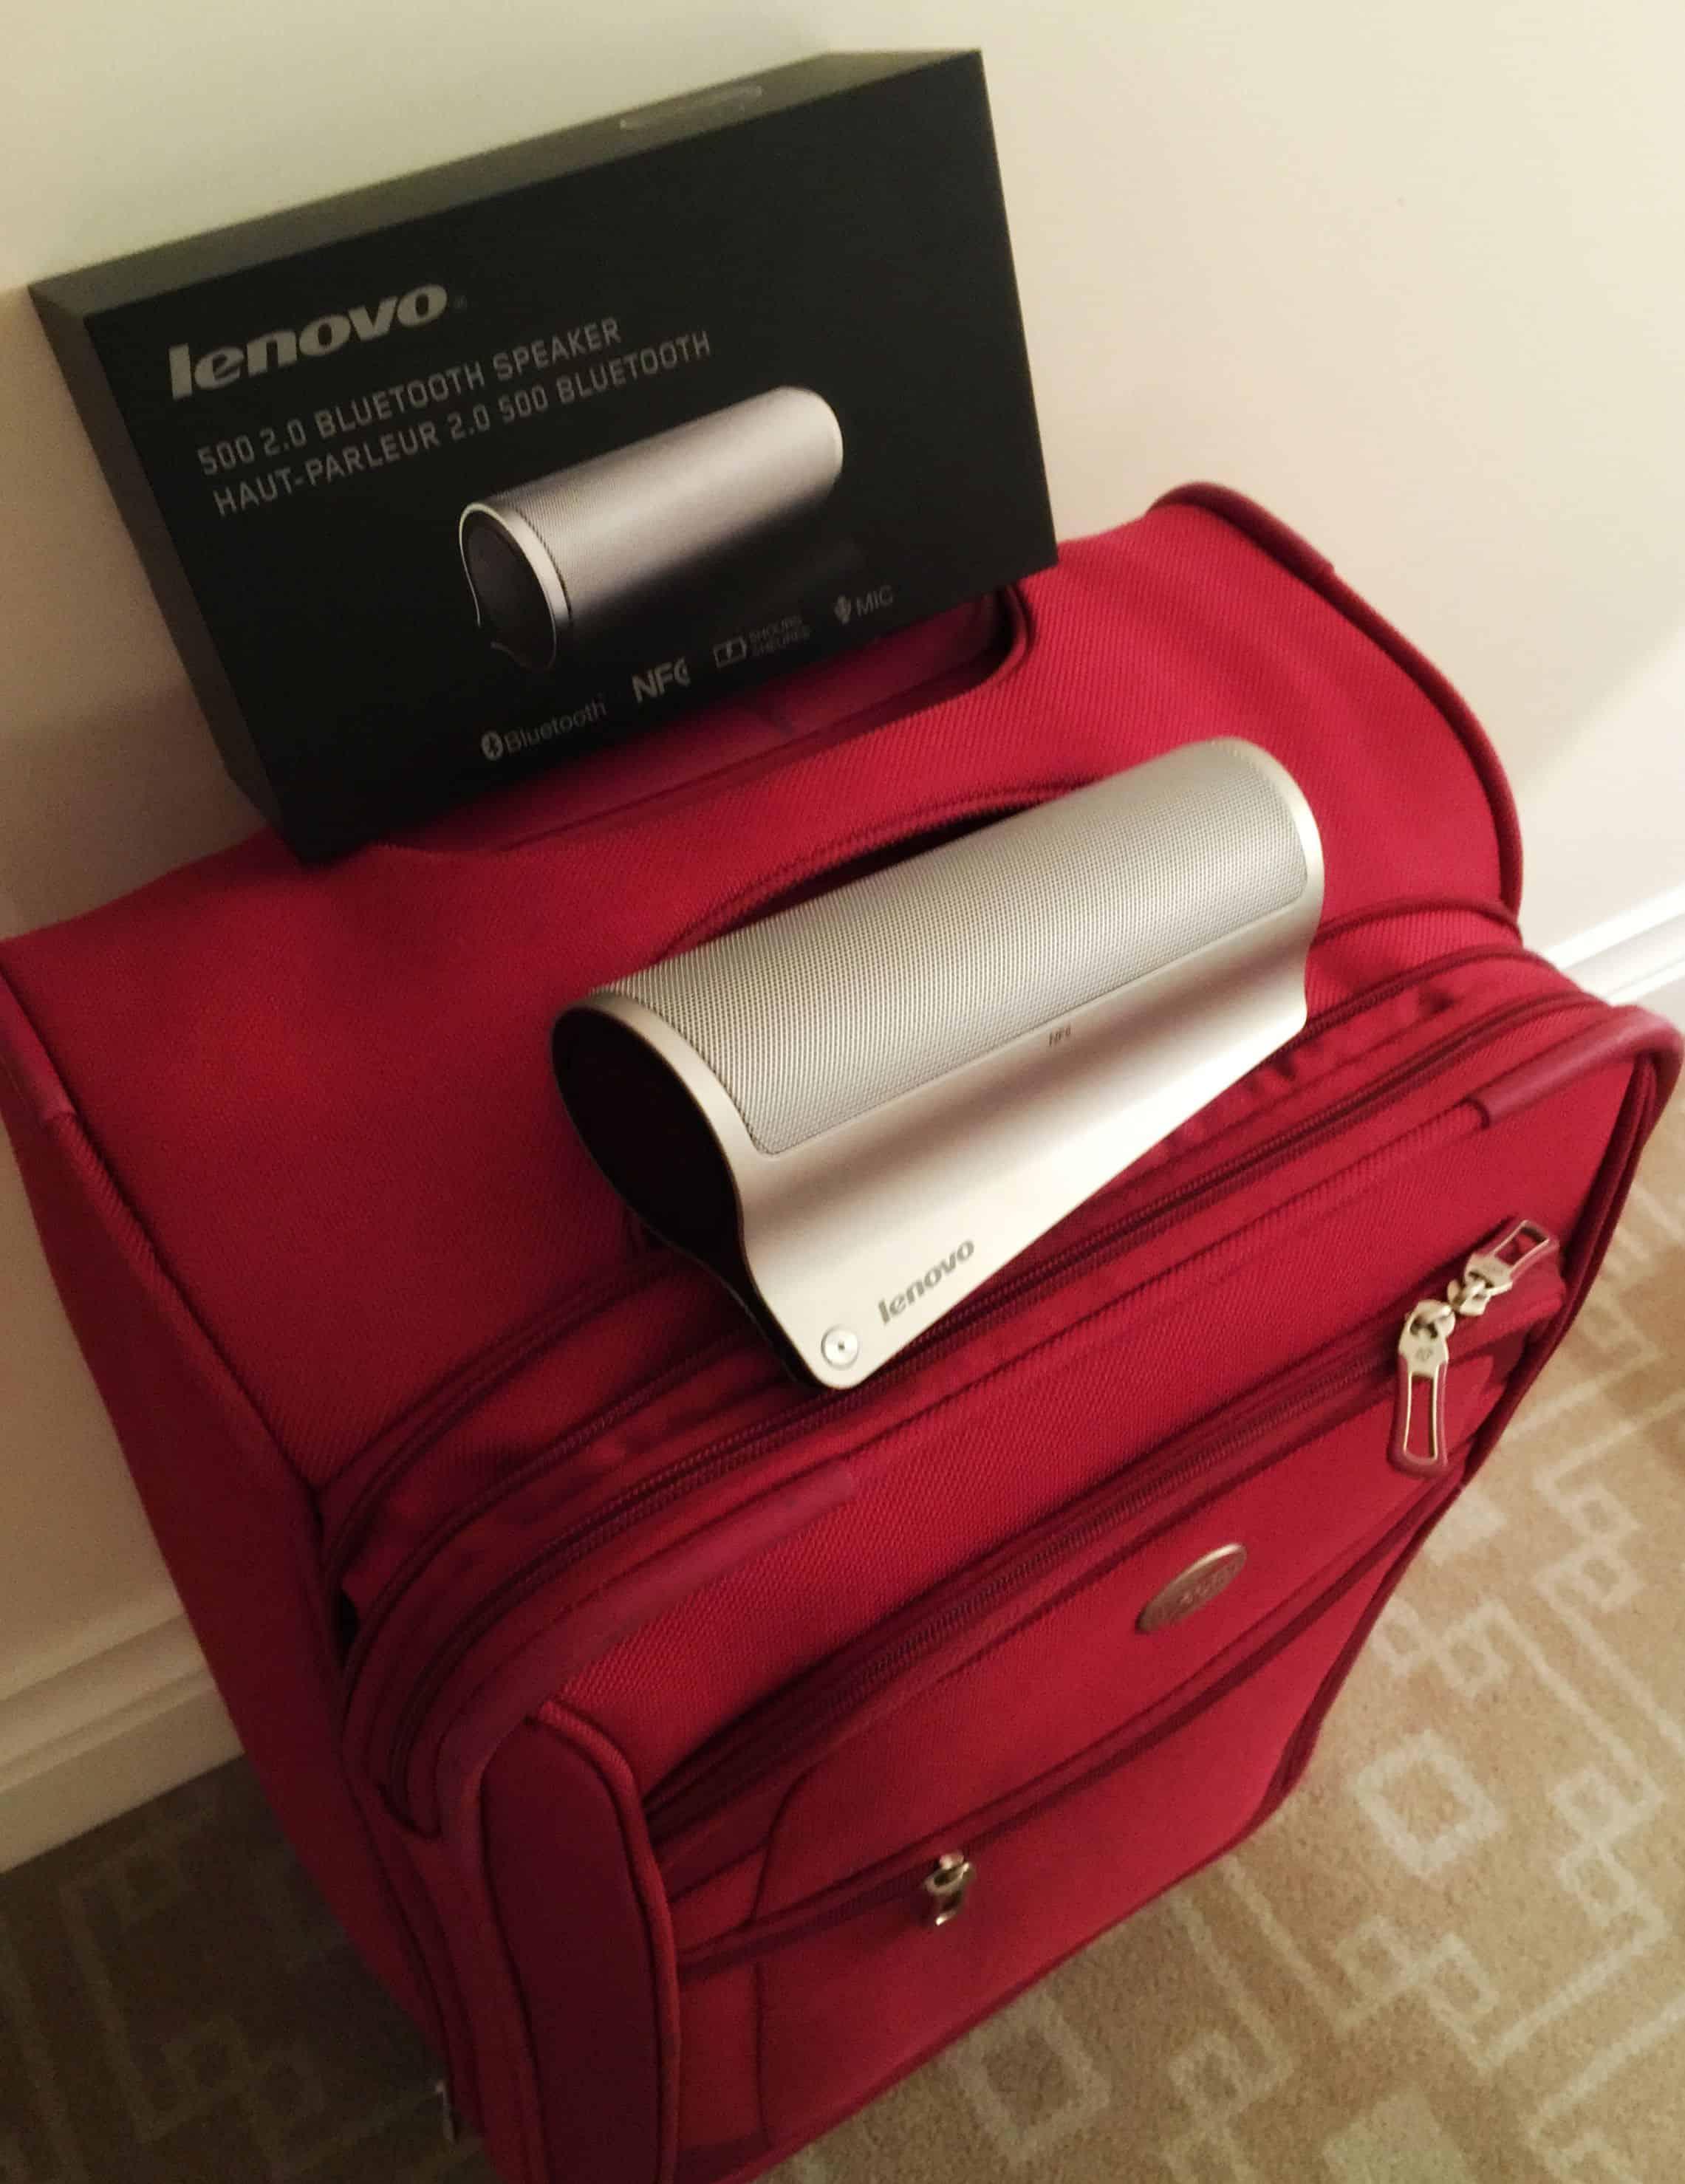 suitcase_lenovo